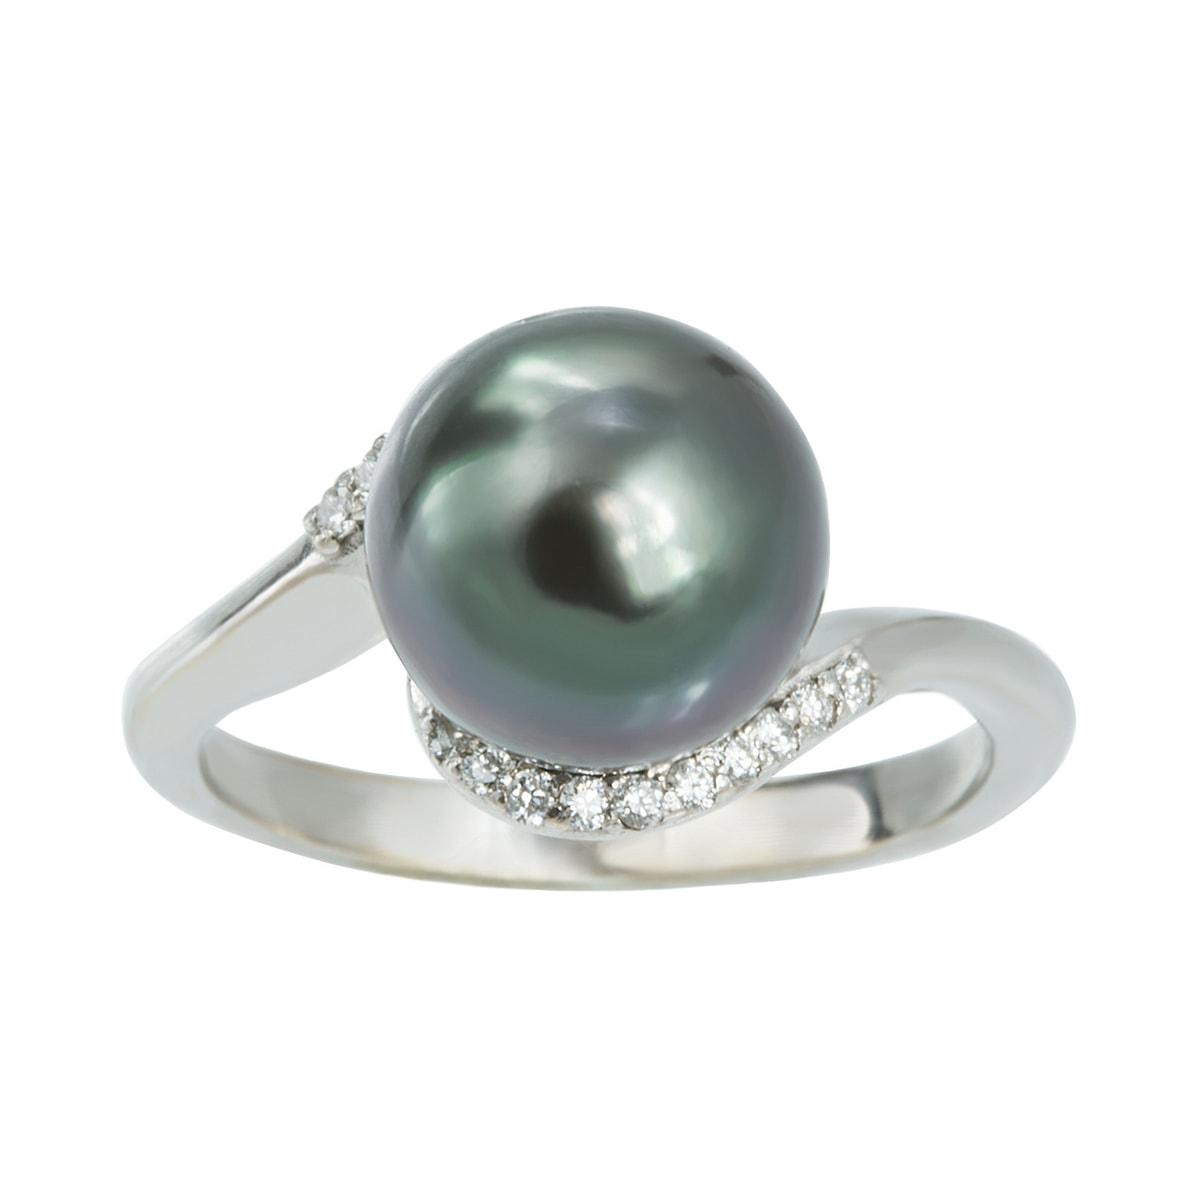 klenota silberring mit tahiti perle und diamanten. Black Bedroom Furniture Sets. Home Design Ideas